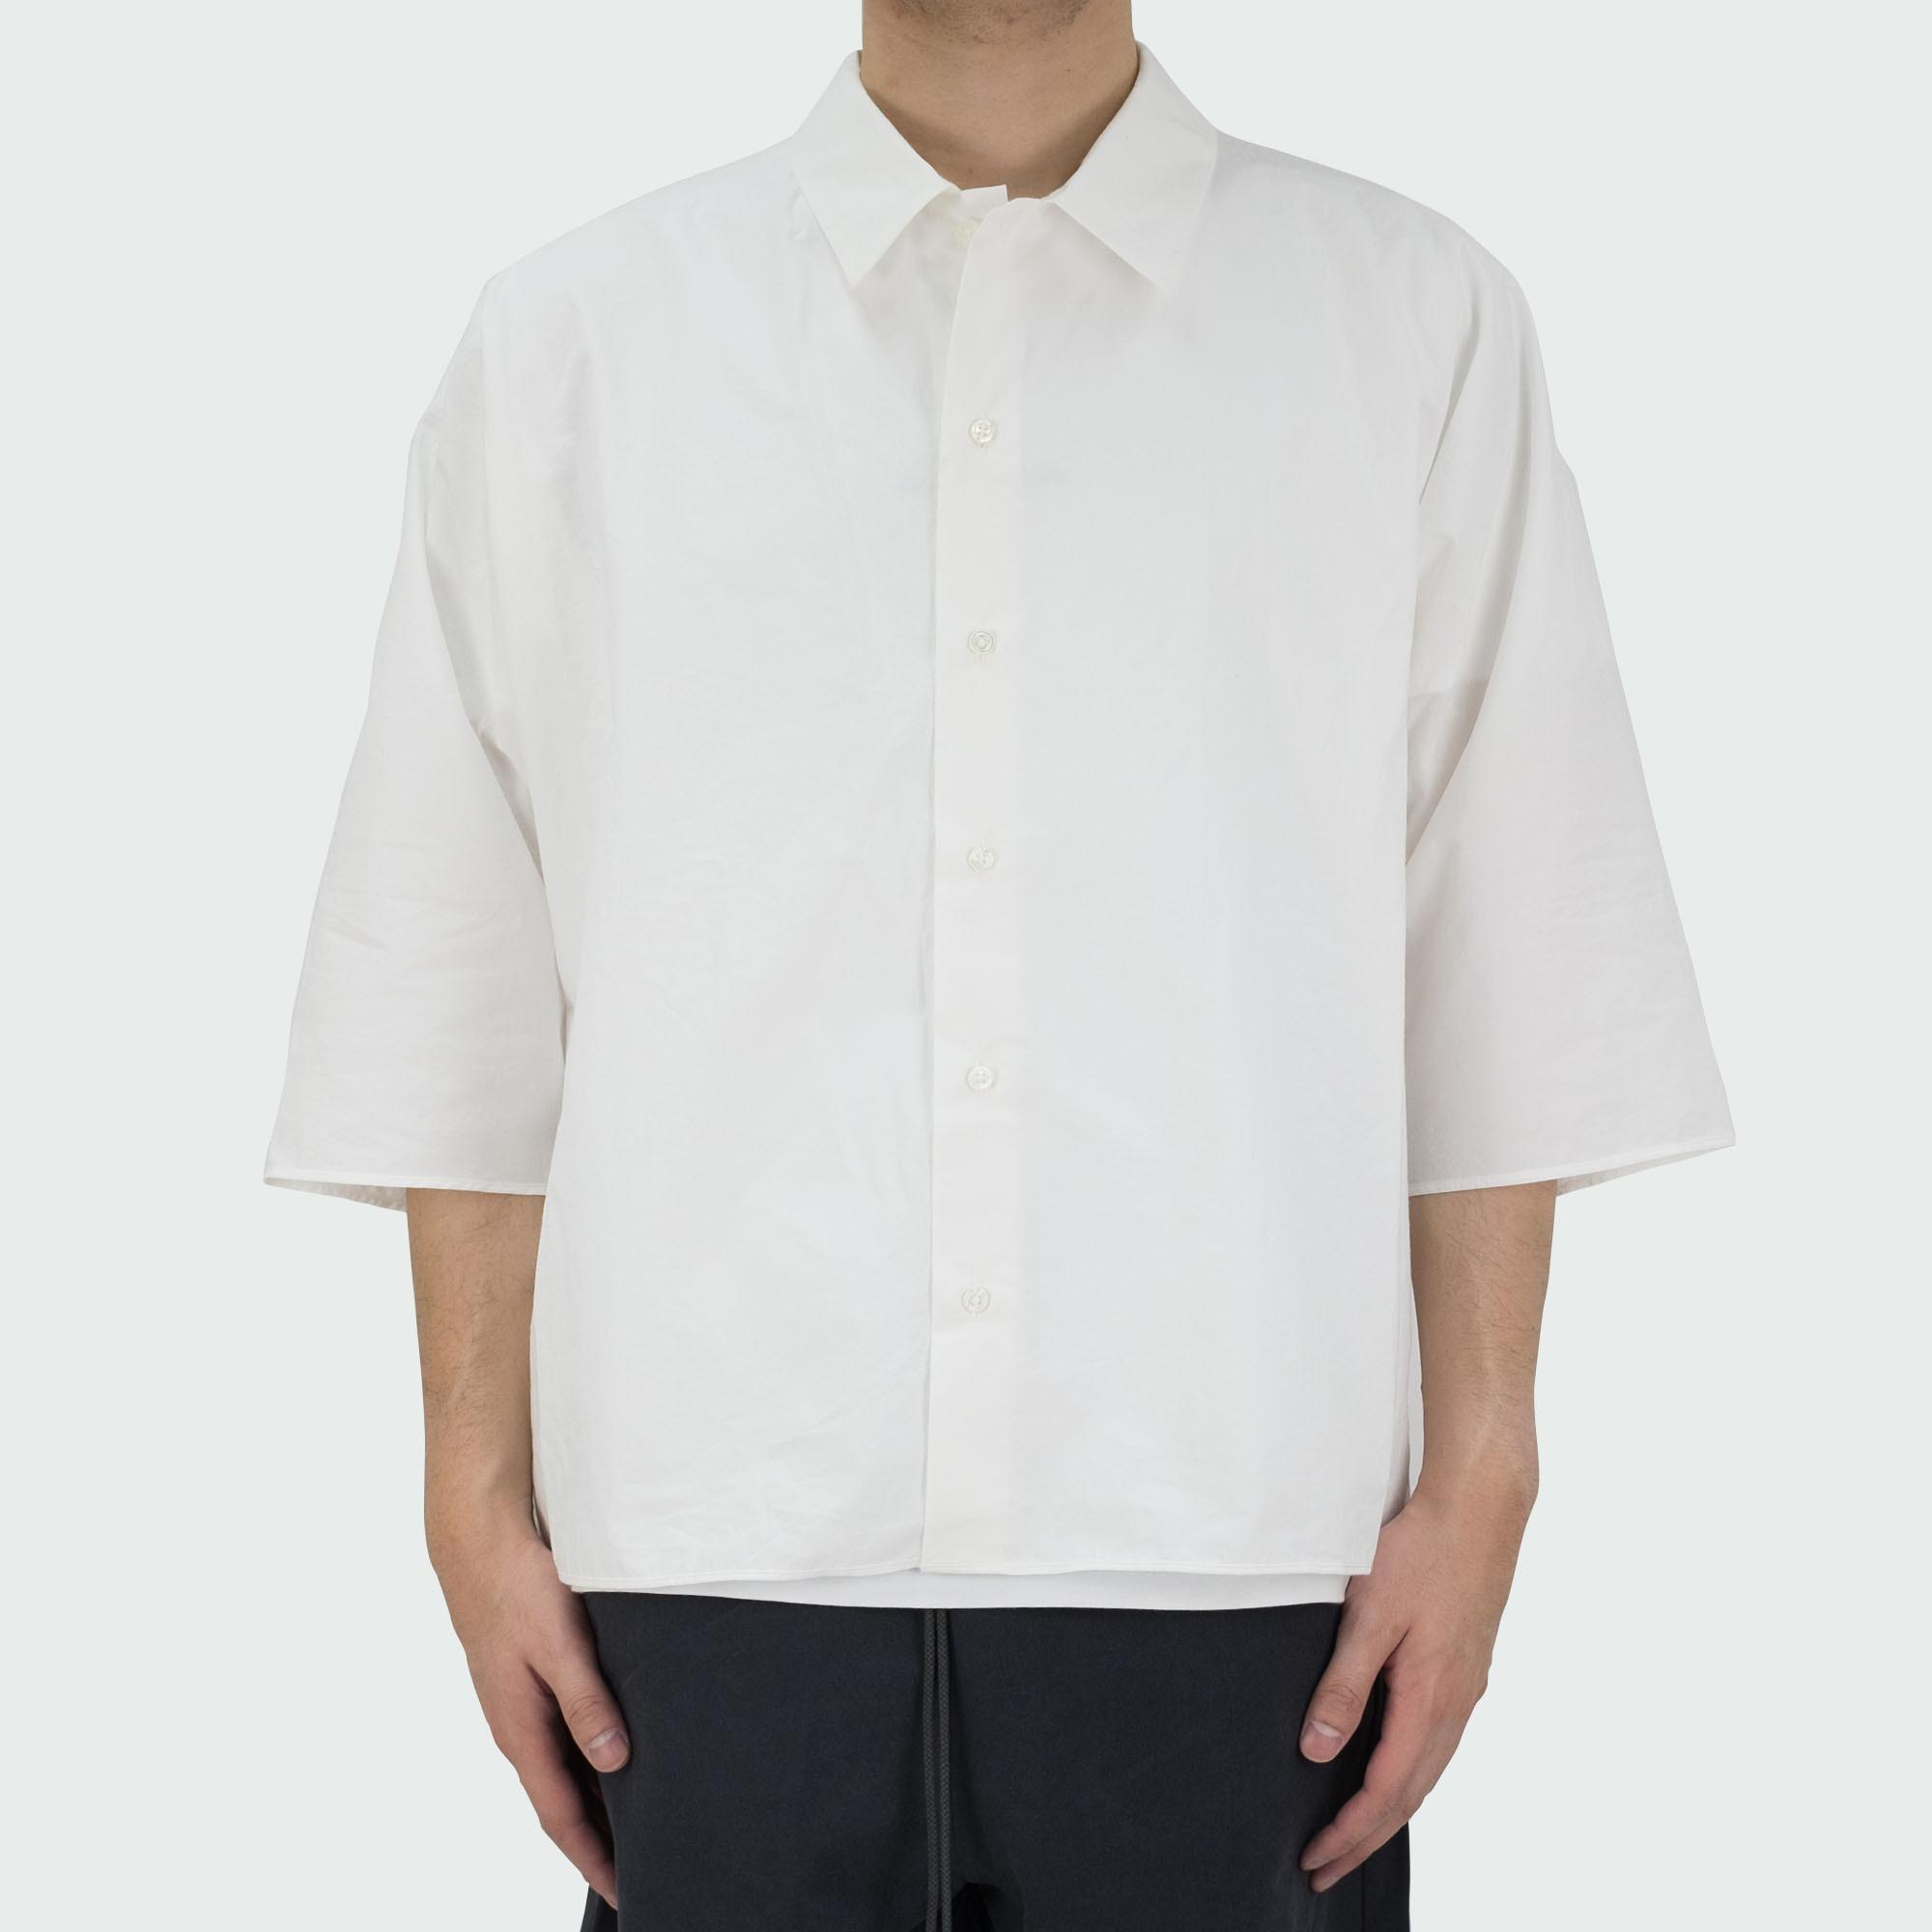 Dolman Sleeve S-S Shirt Off White 2